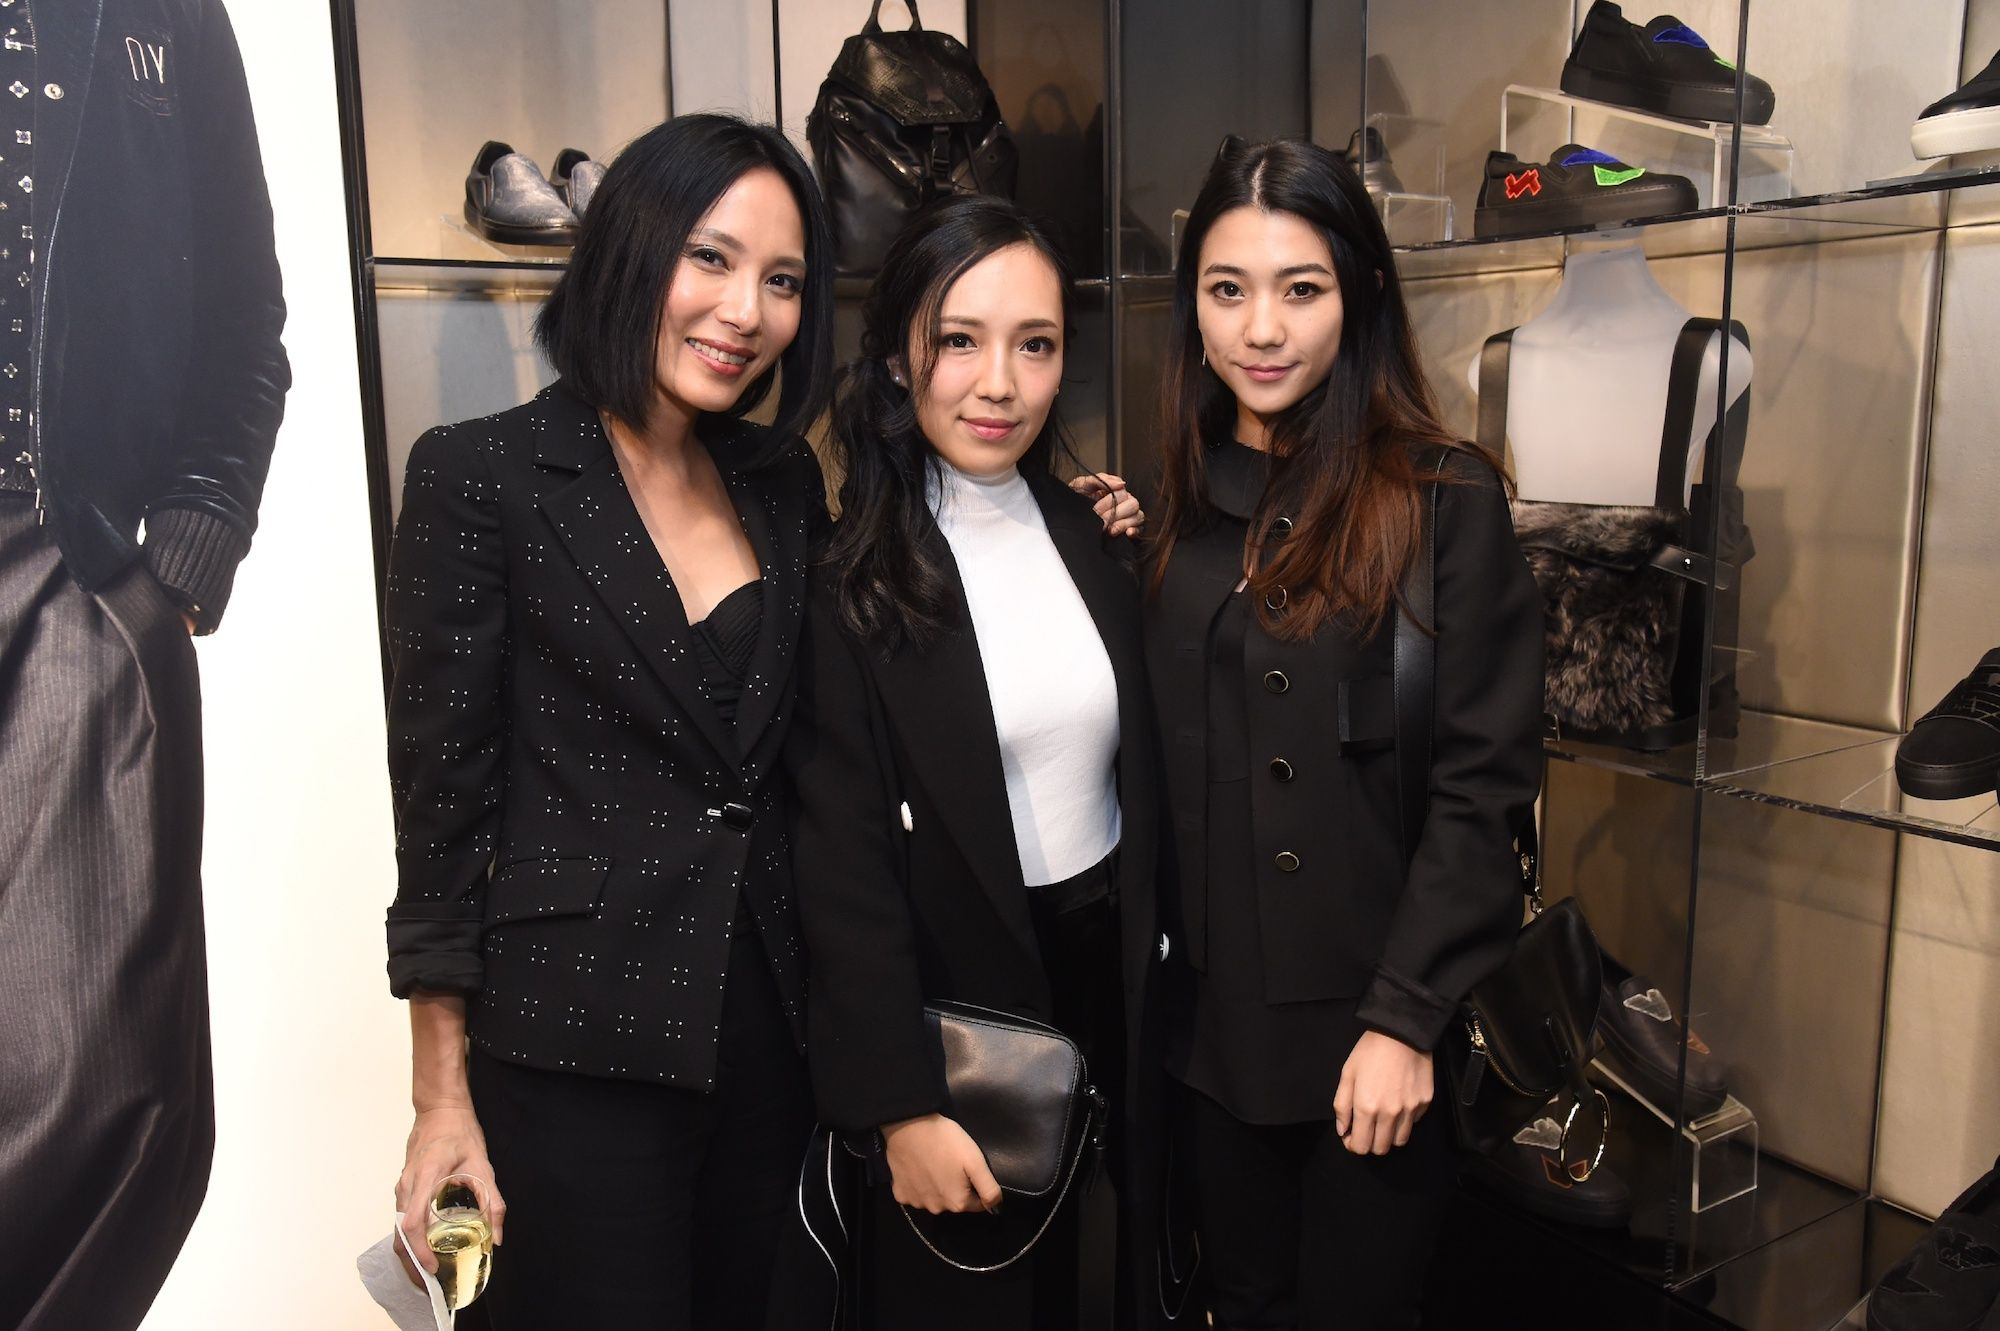 Jaime Ku, Christine Fok, Vincy Yeung